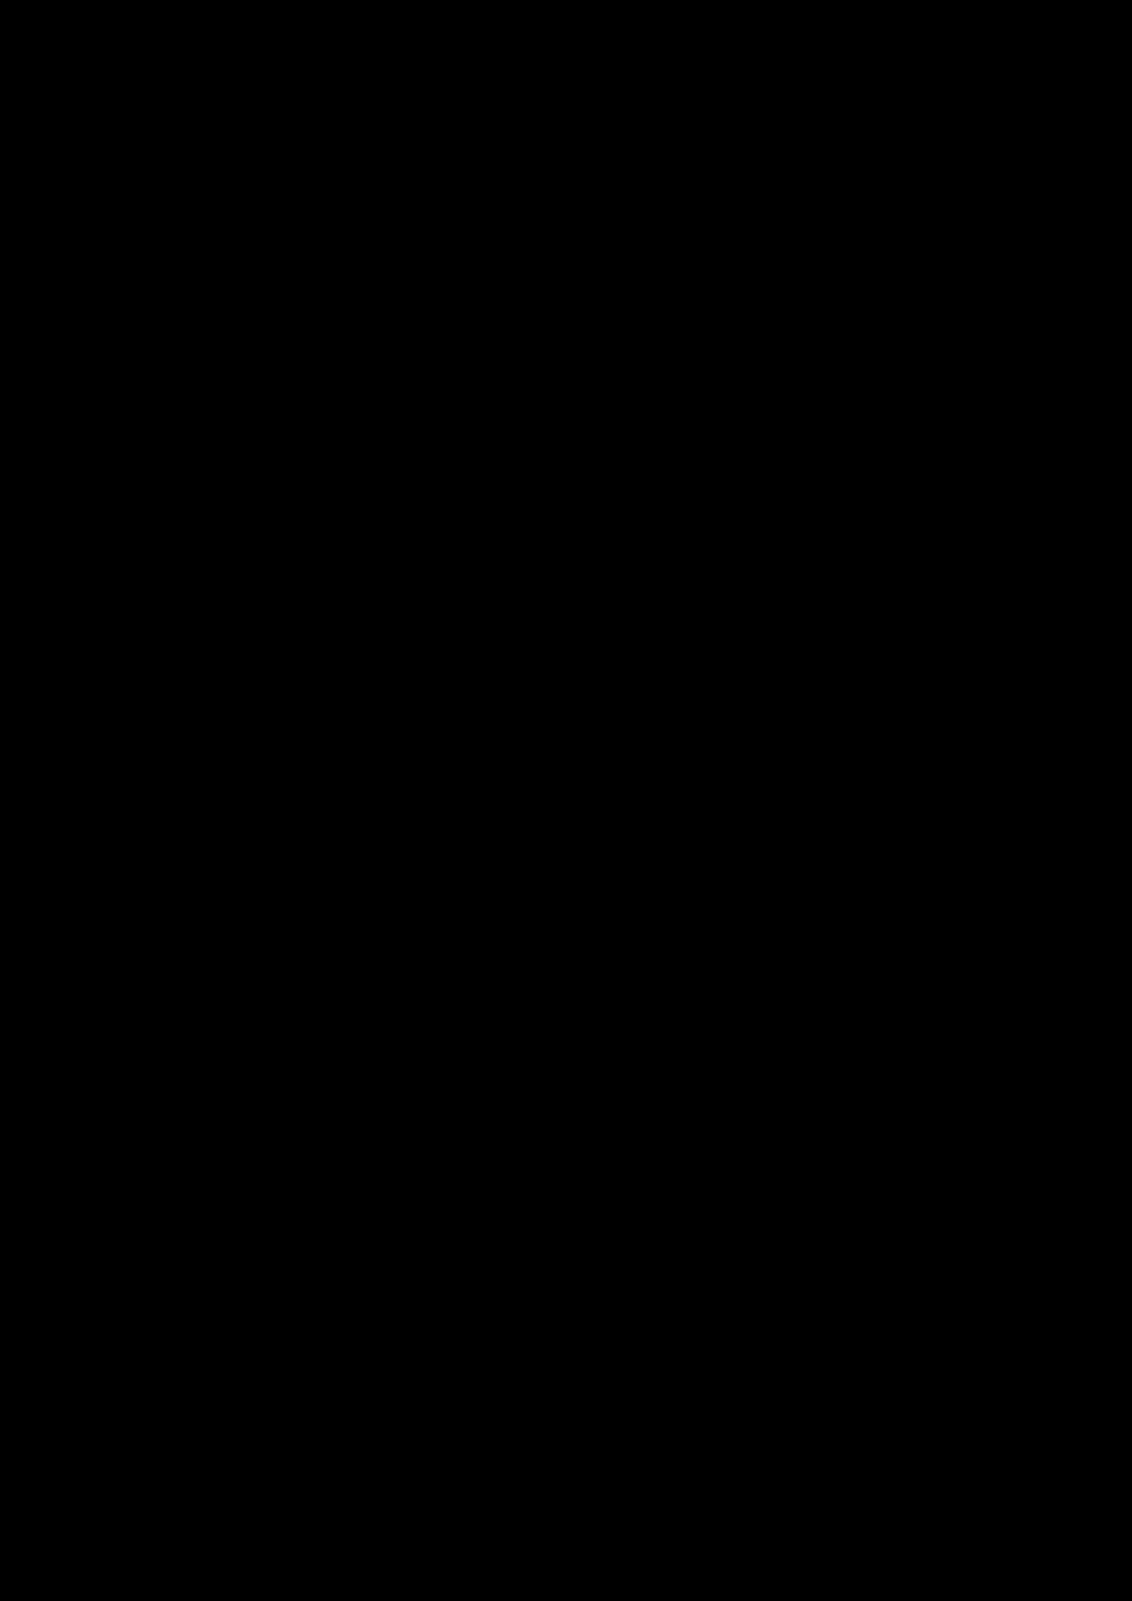 Ten lyubvi slide, Image 39